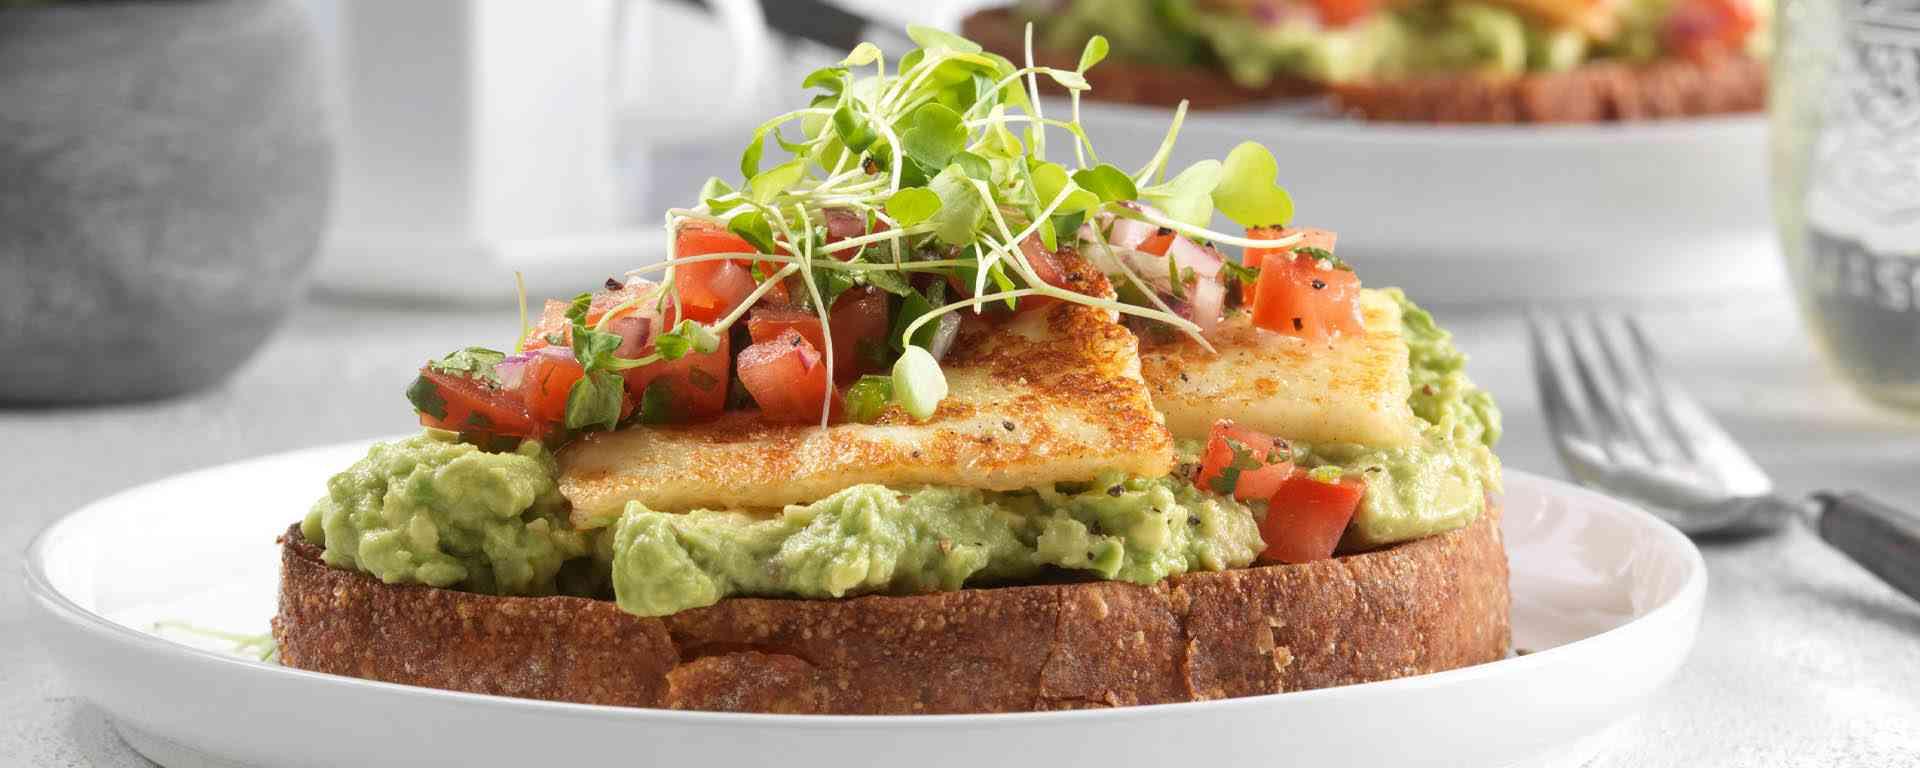 Photo for - Avocado and Halloumi Breakfast Sandwiches